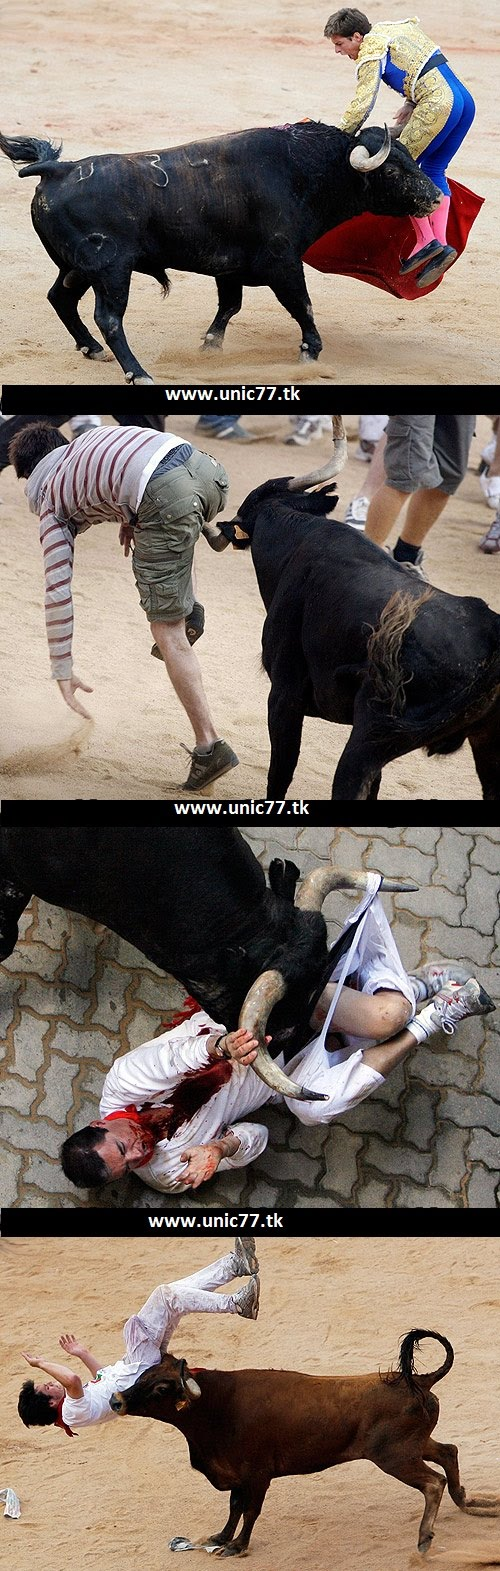 http://2.bp.blogspot.com/_YyXZ9LFygq0/TNSQU5DoC2I/AAAAAAAACtM/Qf7HDiEsa_0/s1600/110210-bull-horns.jpg